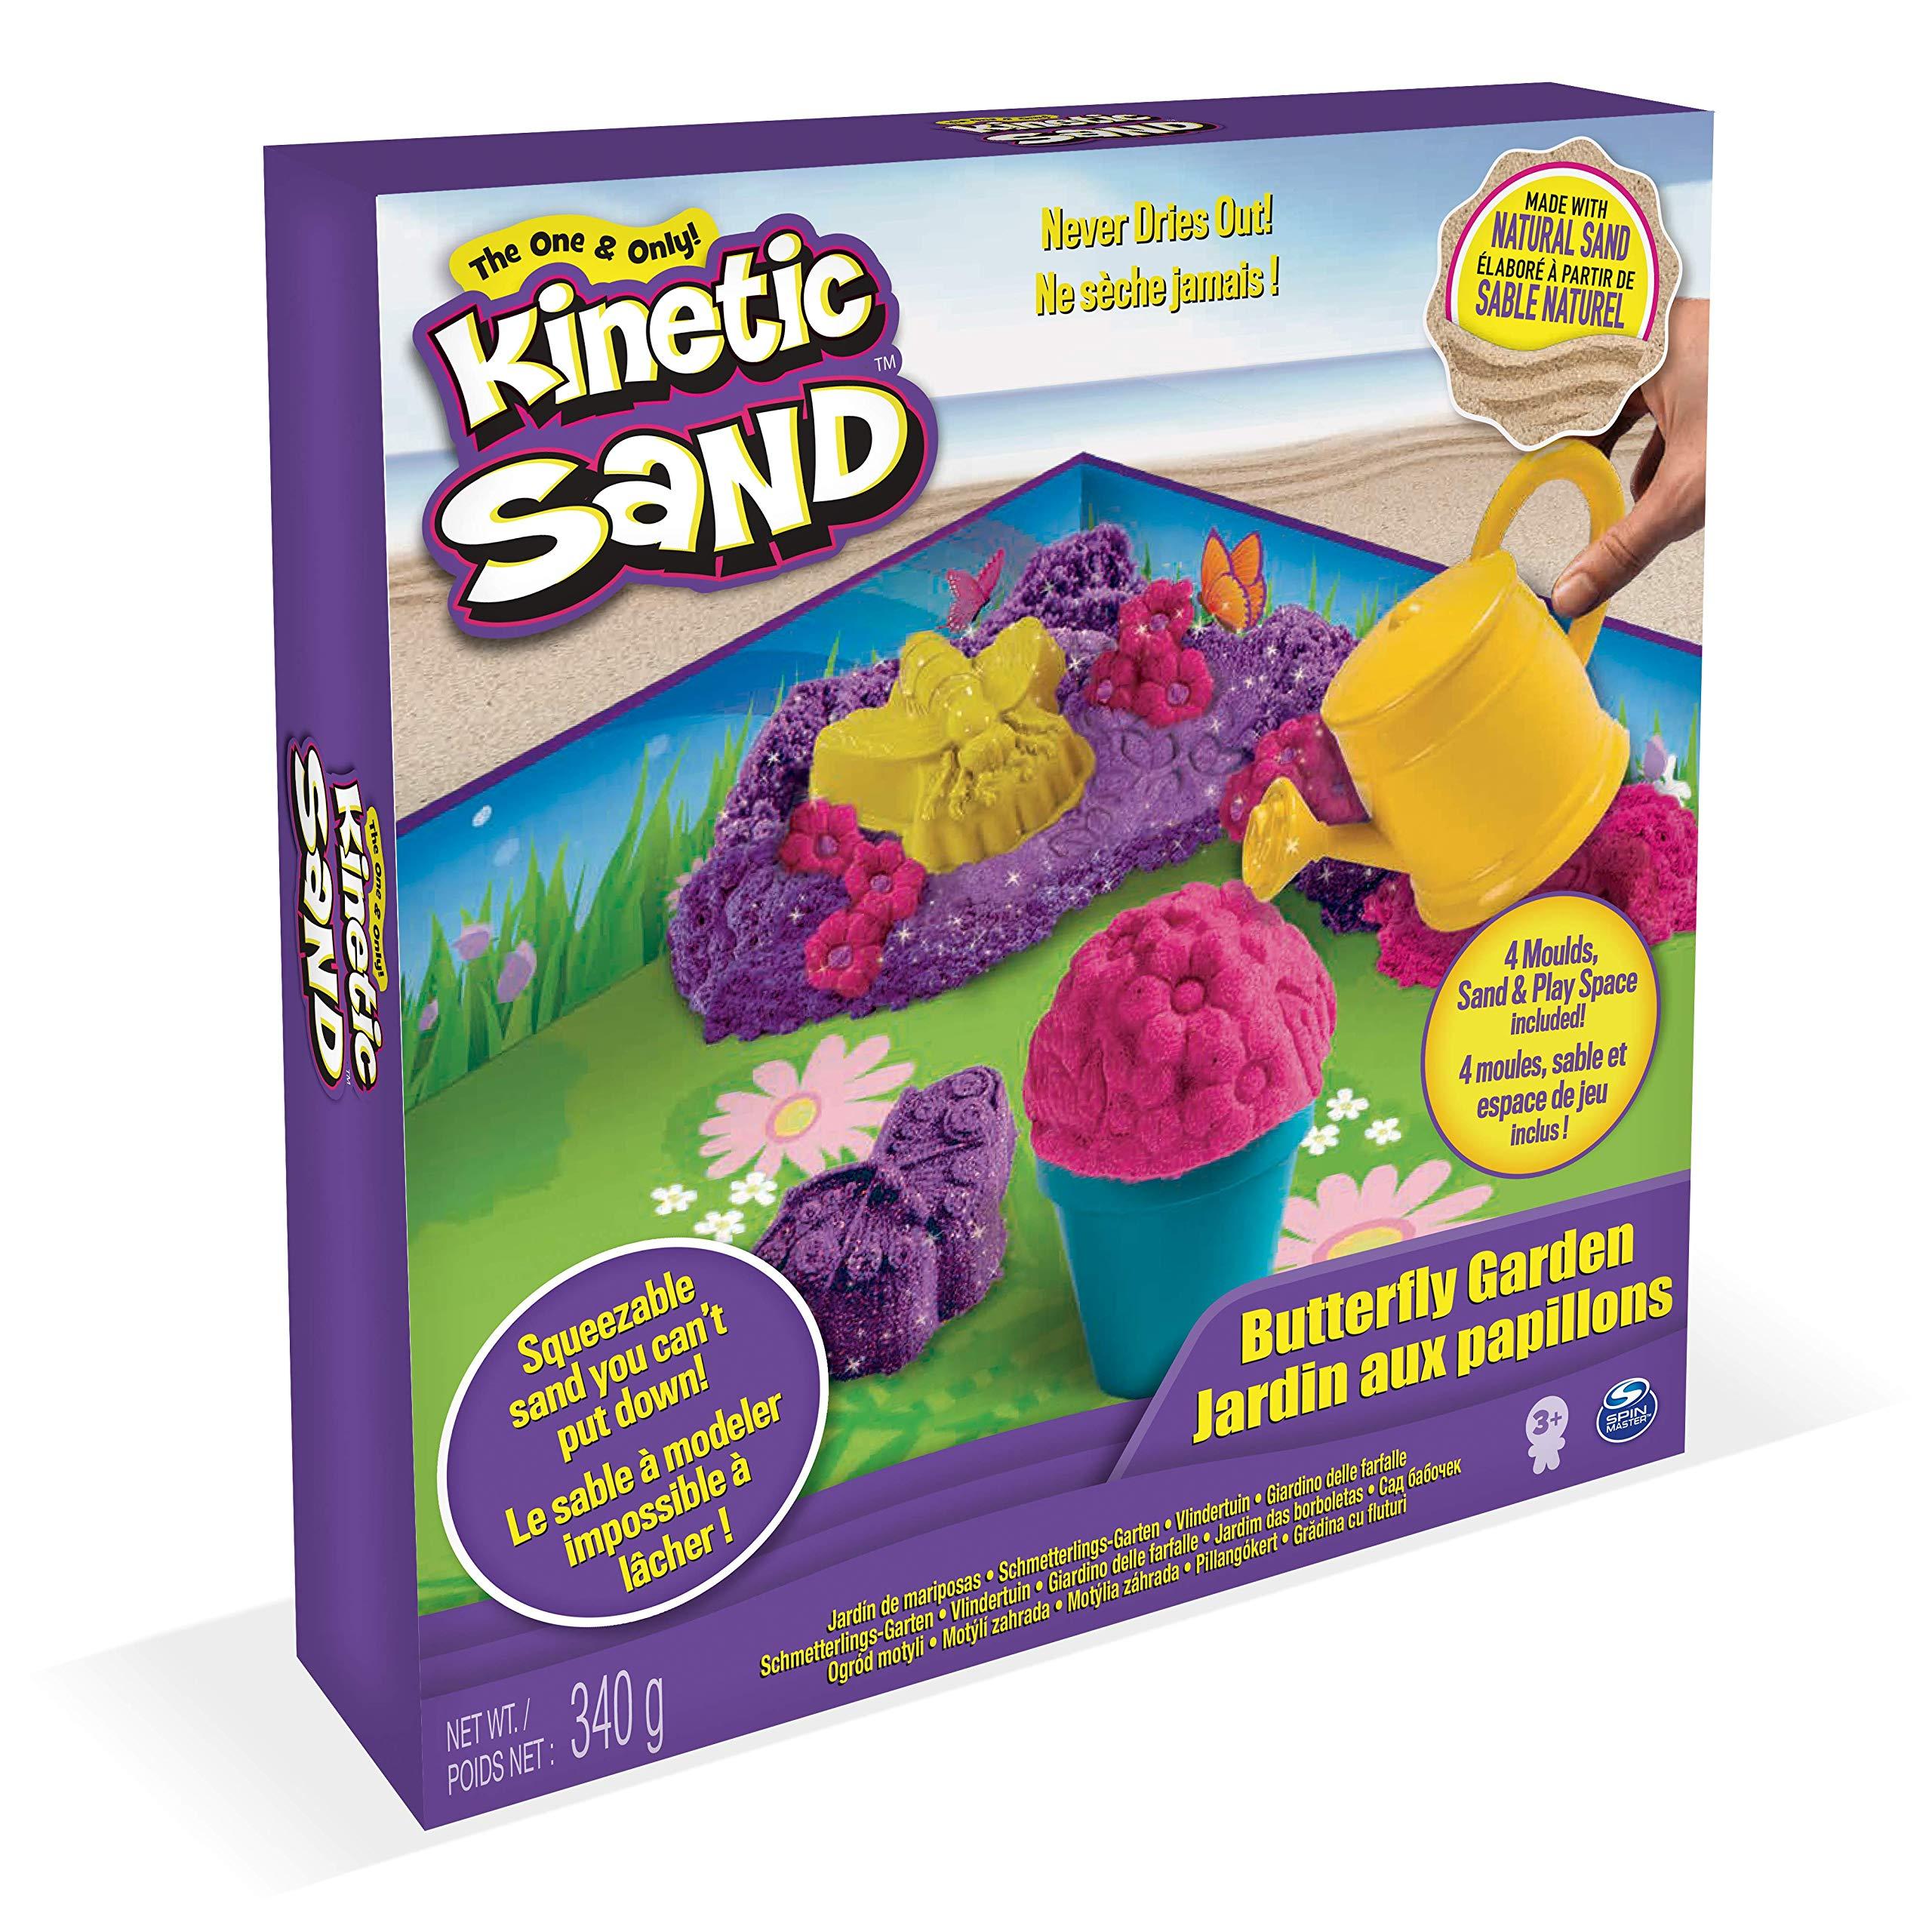 1lb 450g Pink Play Sand Box with 3 Disney Princess Play Sand Set for Kids